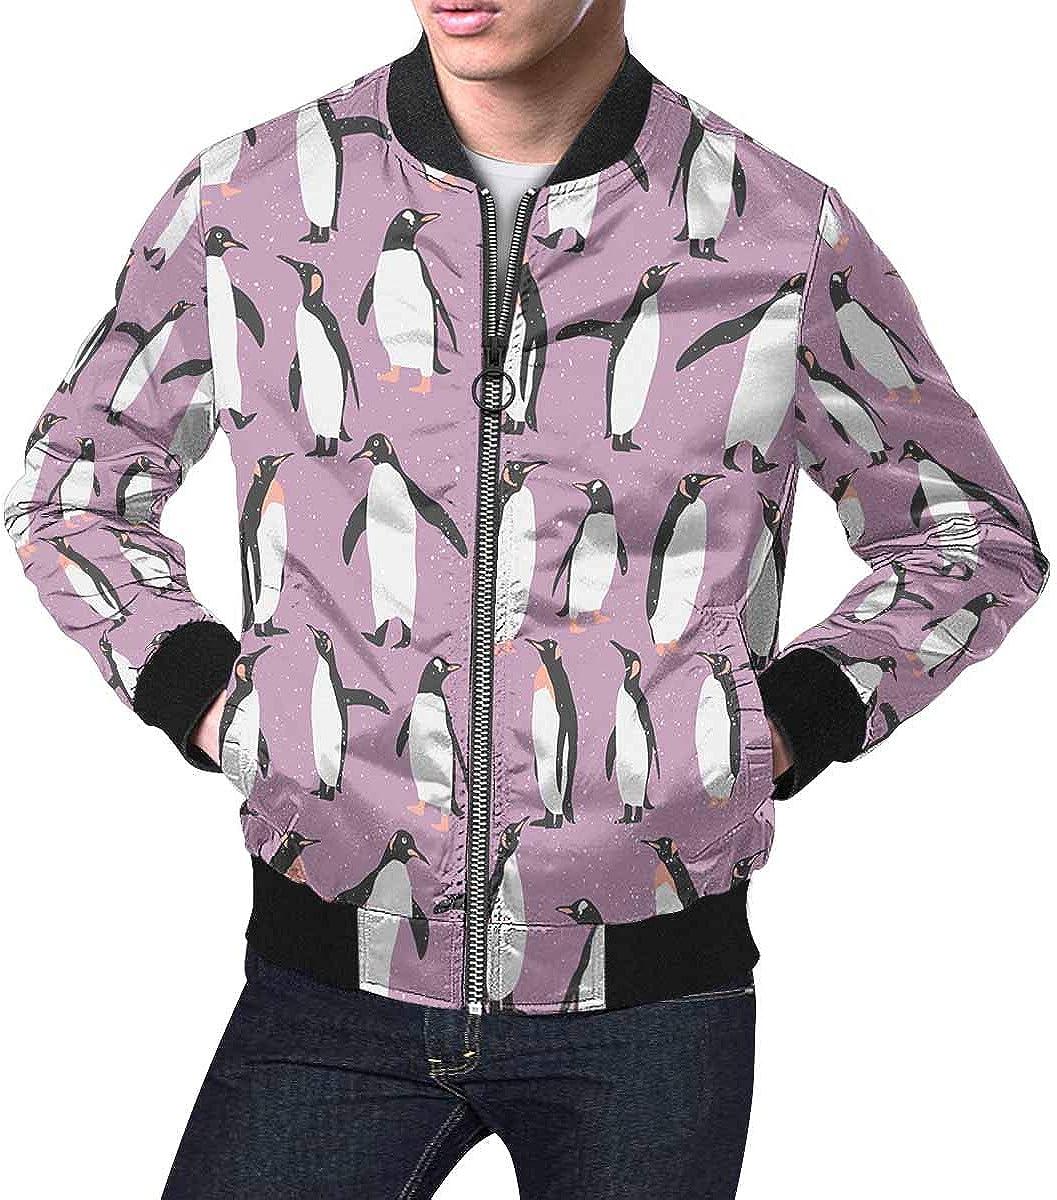 INTERESTPRINT Men's Stand Collar Jacket Sn Penguin with Patterns Tulsa Mall Mail order